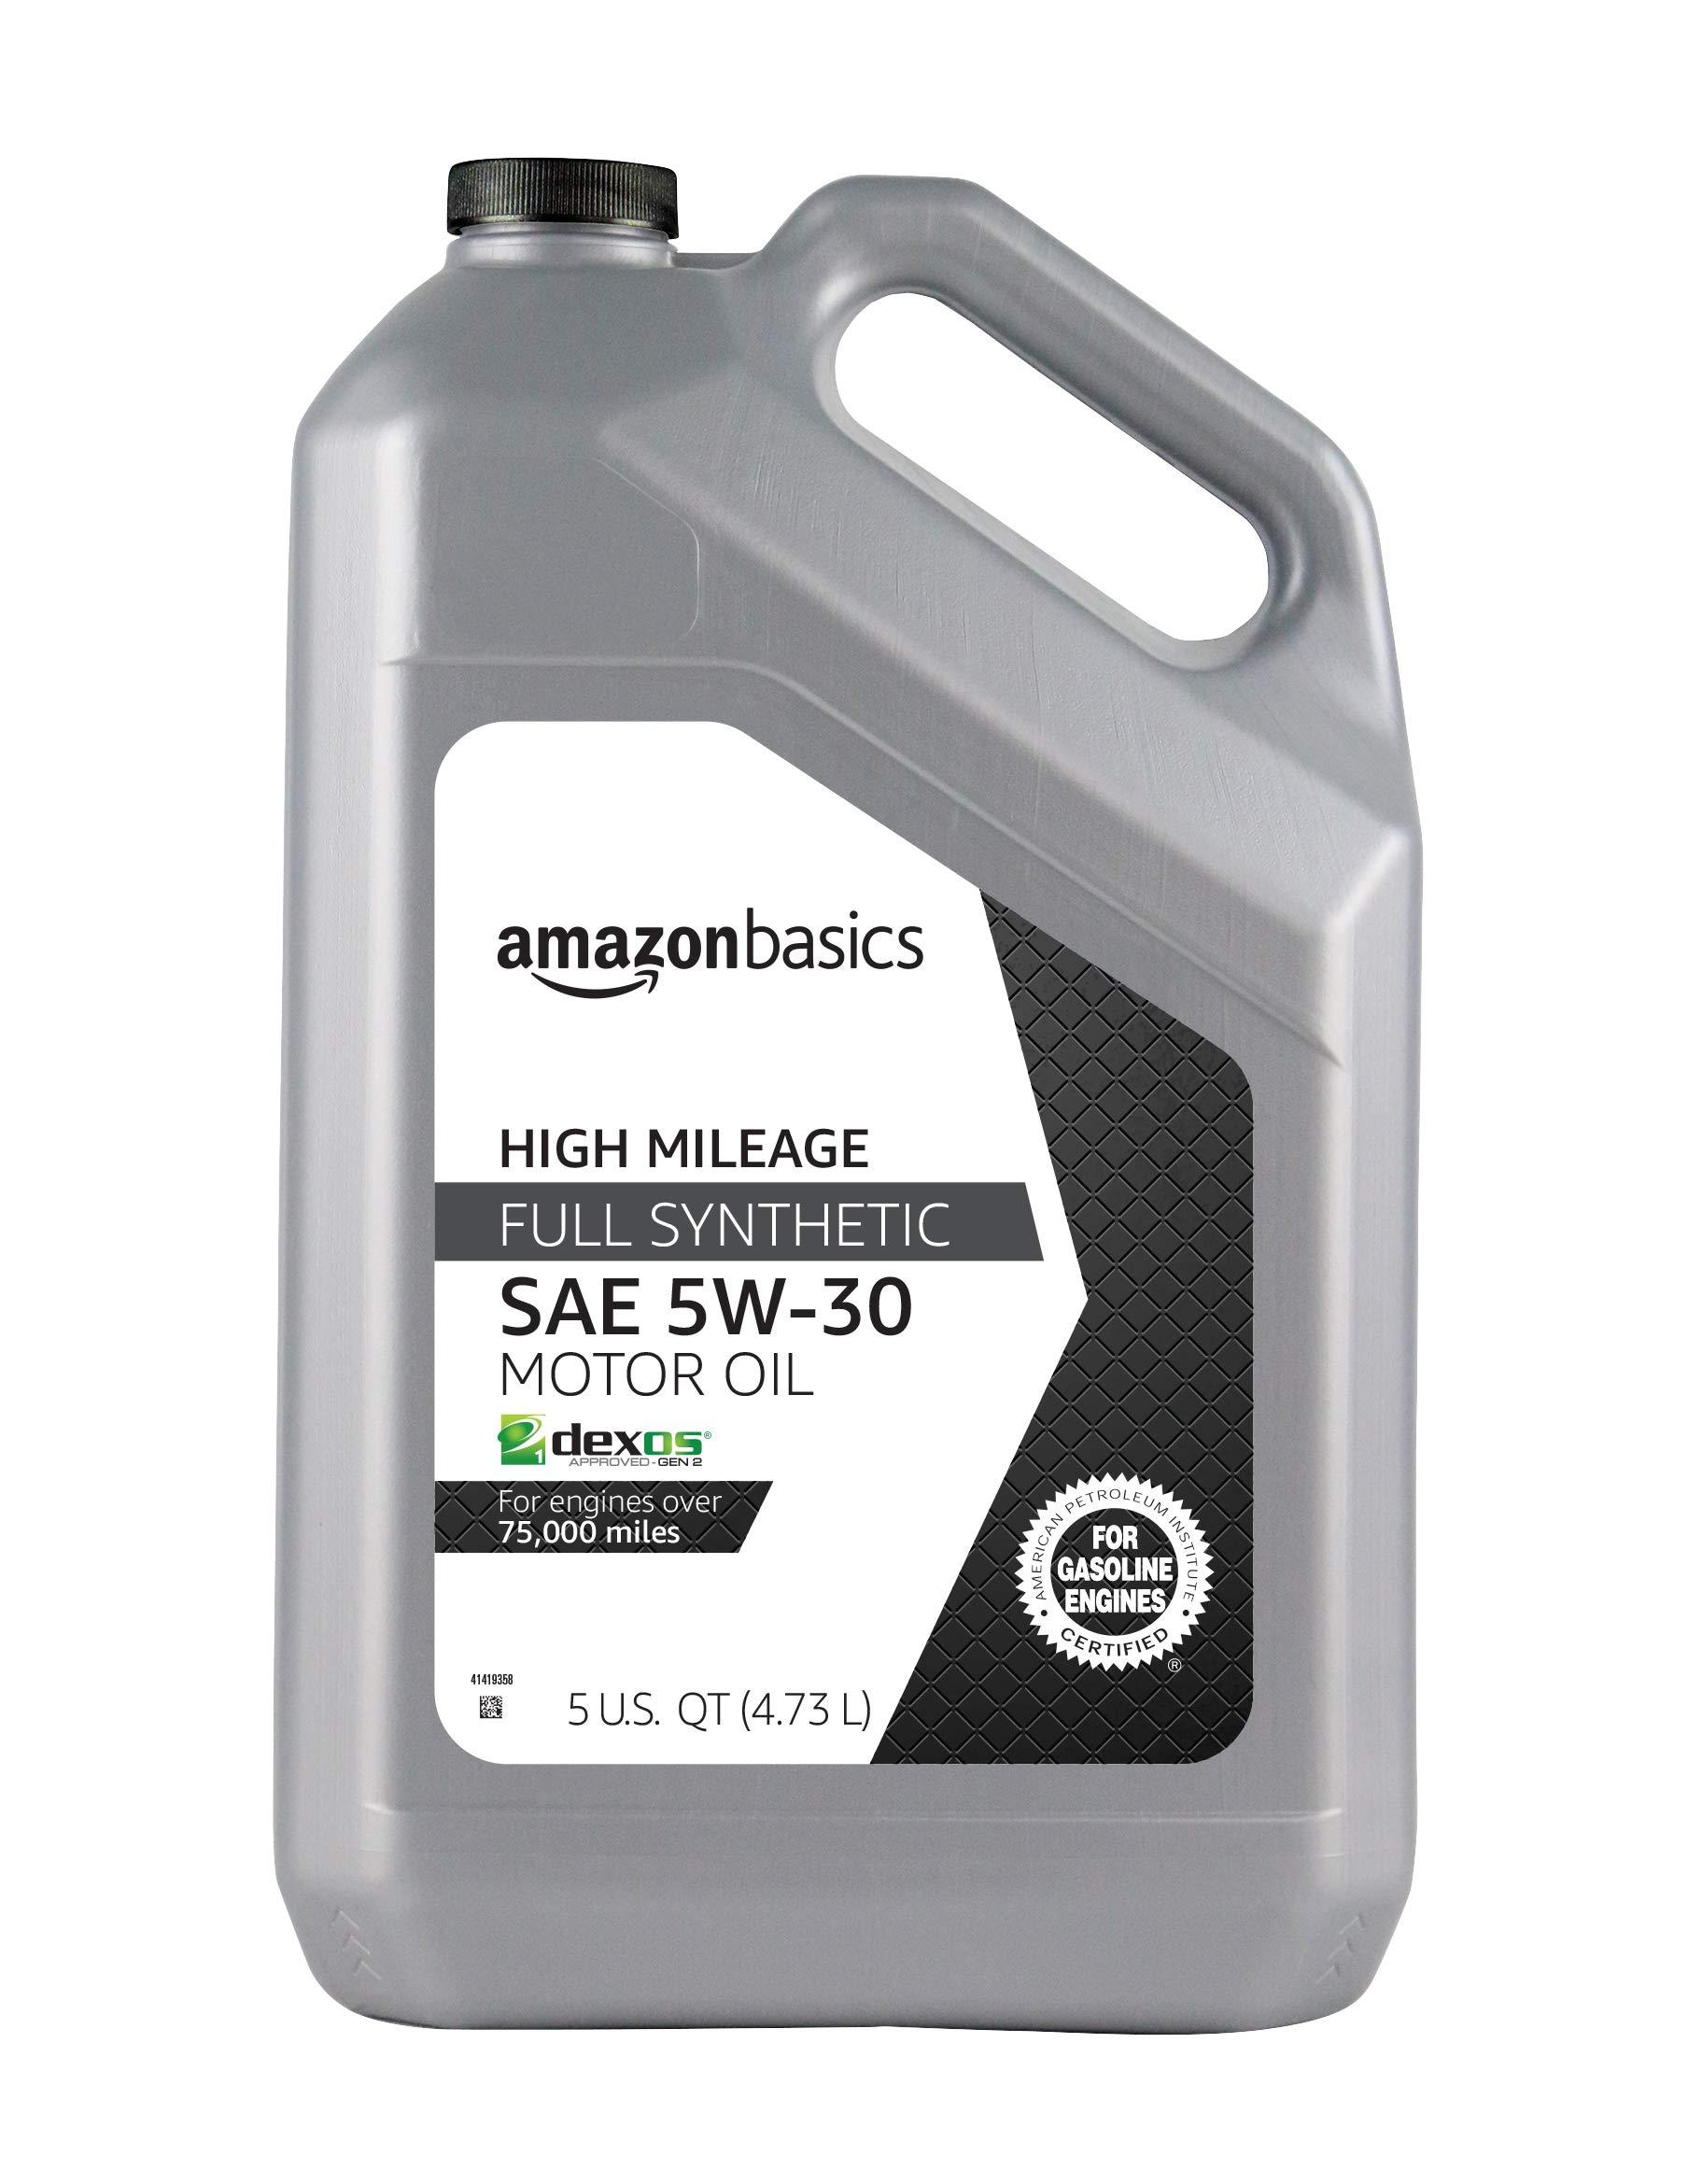 AmazonBasics High Mileage Motor Oil, Full Synthetic, SN Plus, dexos1-Gen2,  5W-30, 5 Quart